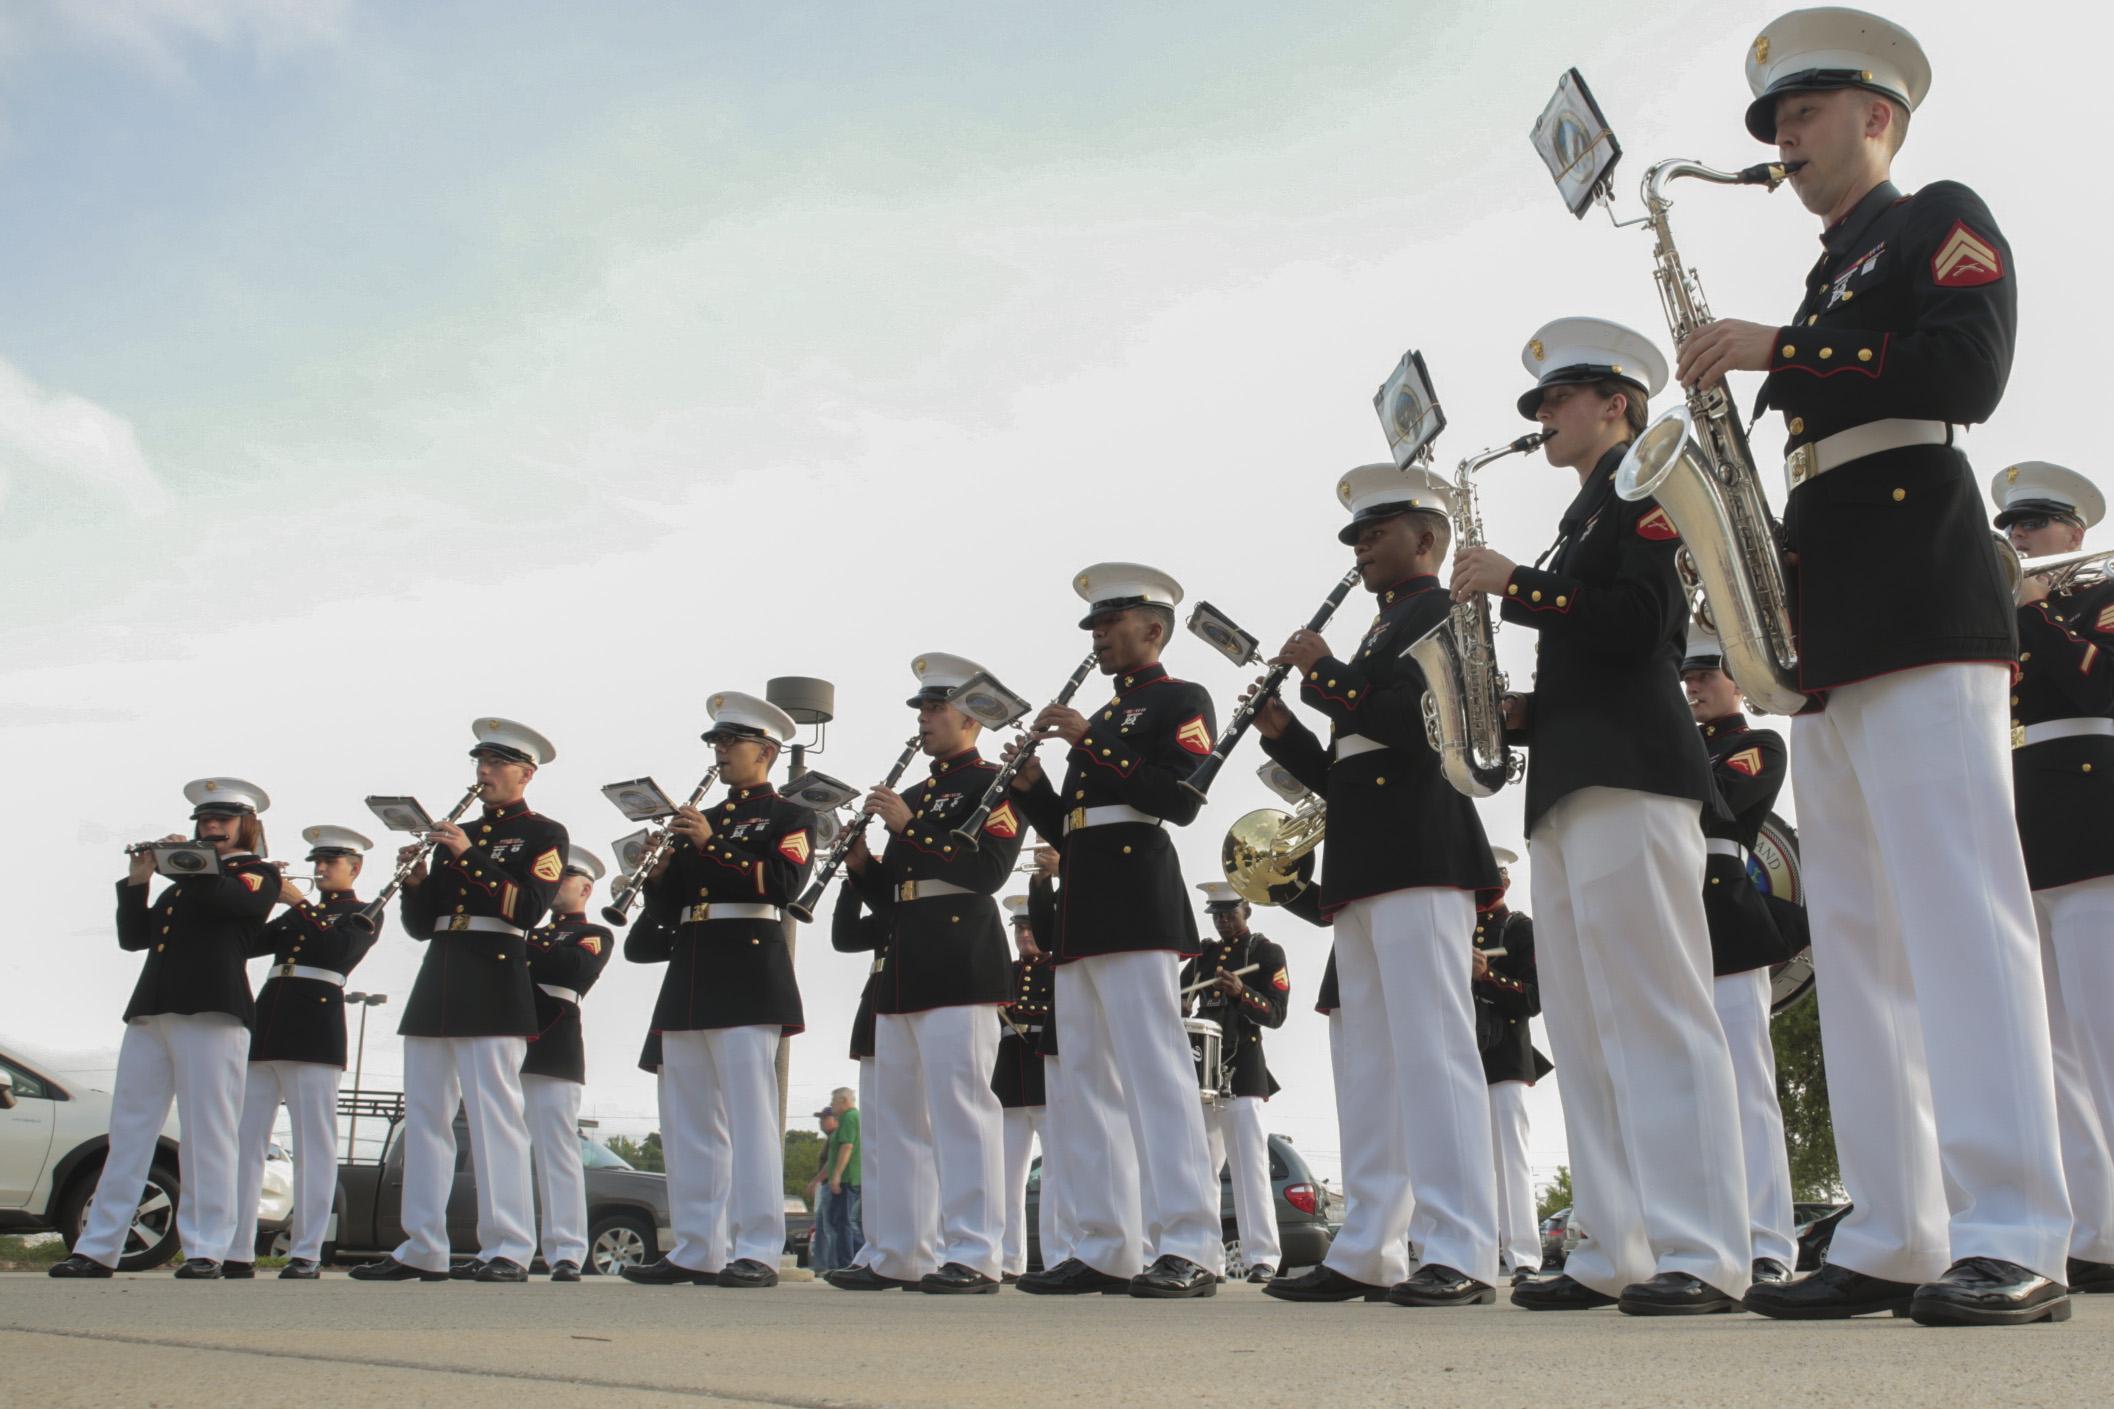 Marines-150410-M-TI204-001_1538761227191.JPG